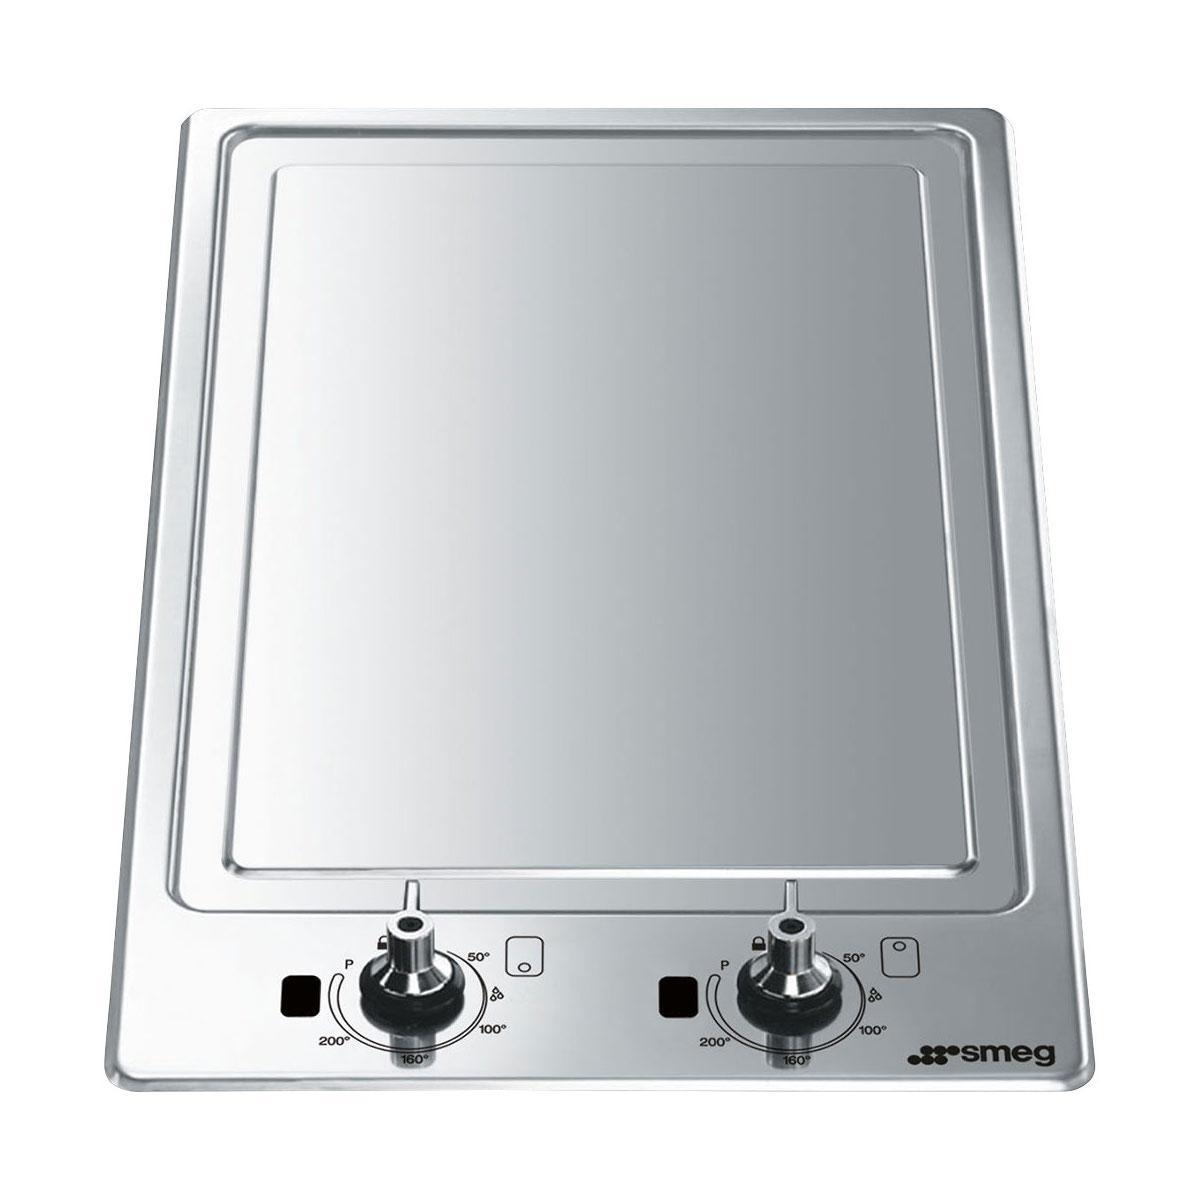 Smeg PGF30T-1 Domino Ultra Low Profile Teppanyaki Hob